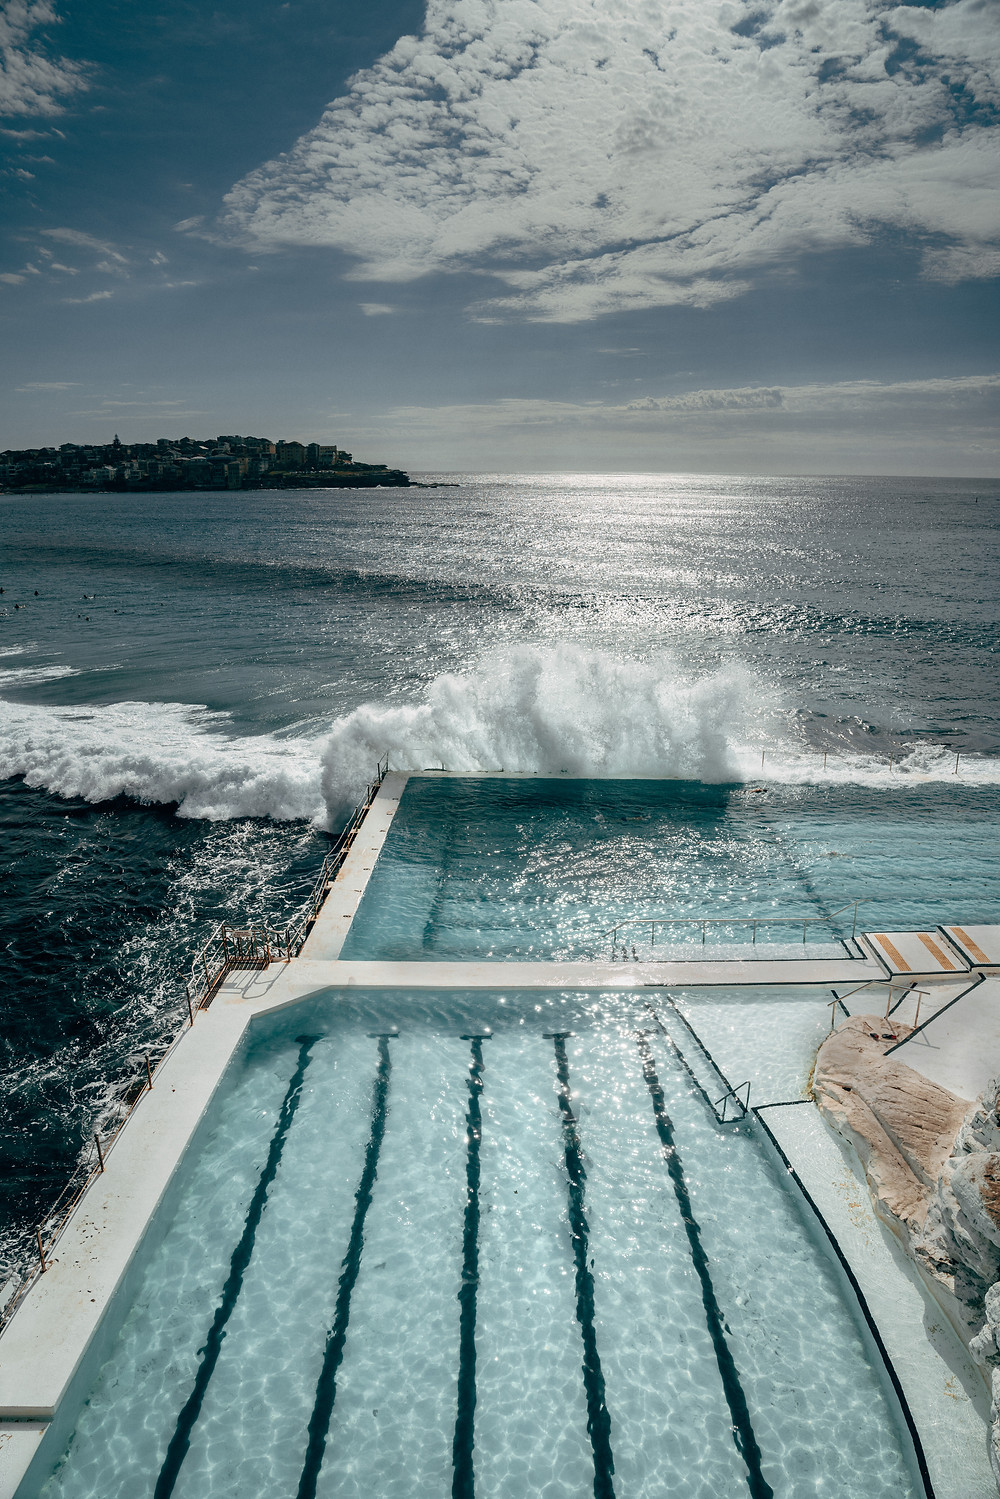 The crashing ocean waves coming on to the Bondi Icebergs olympic swimming pool